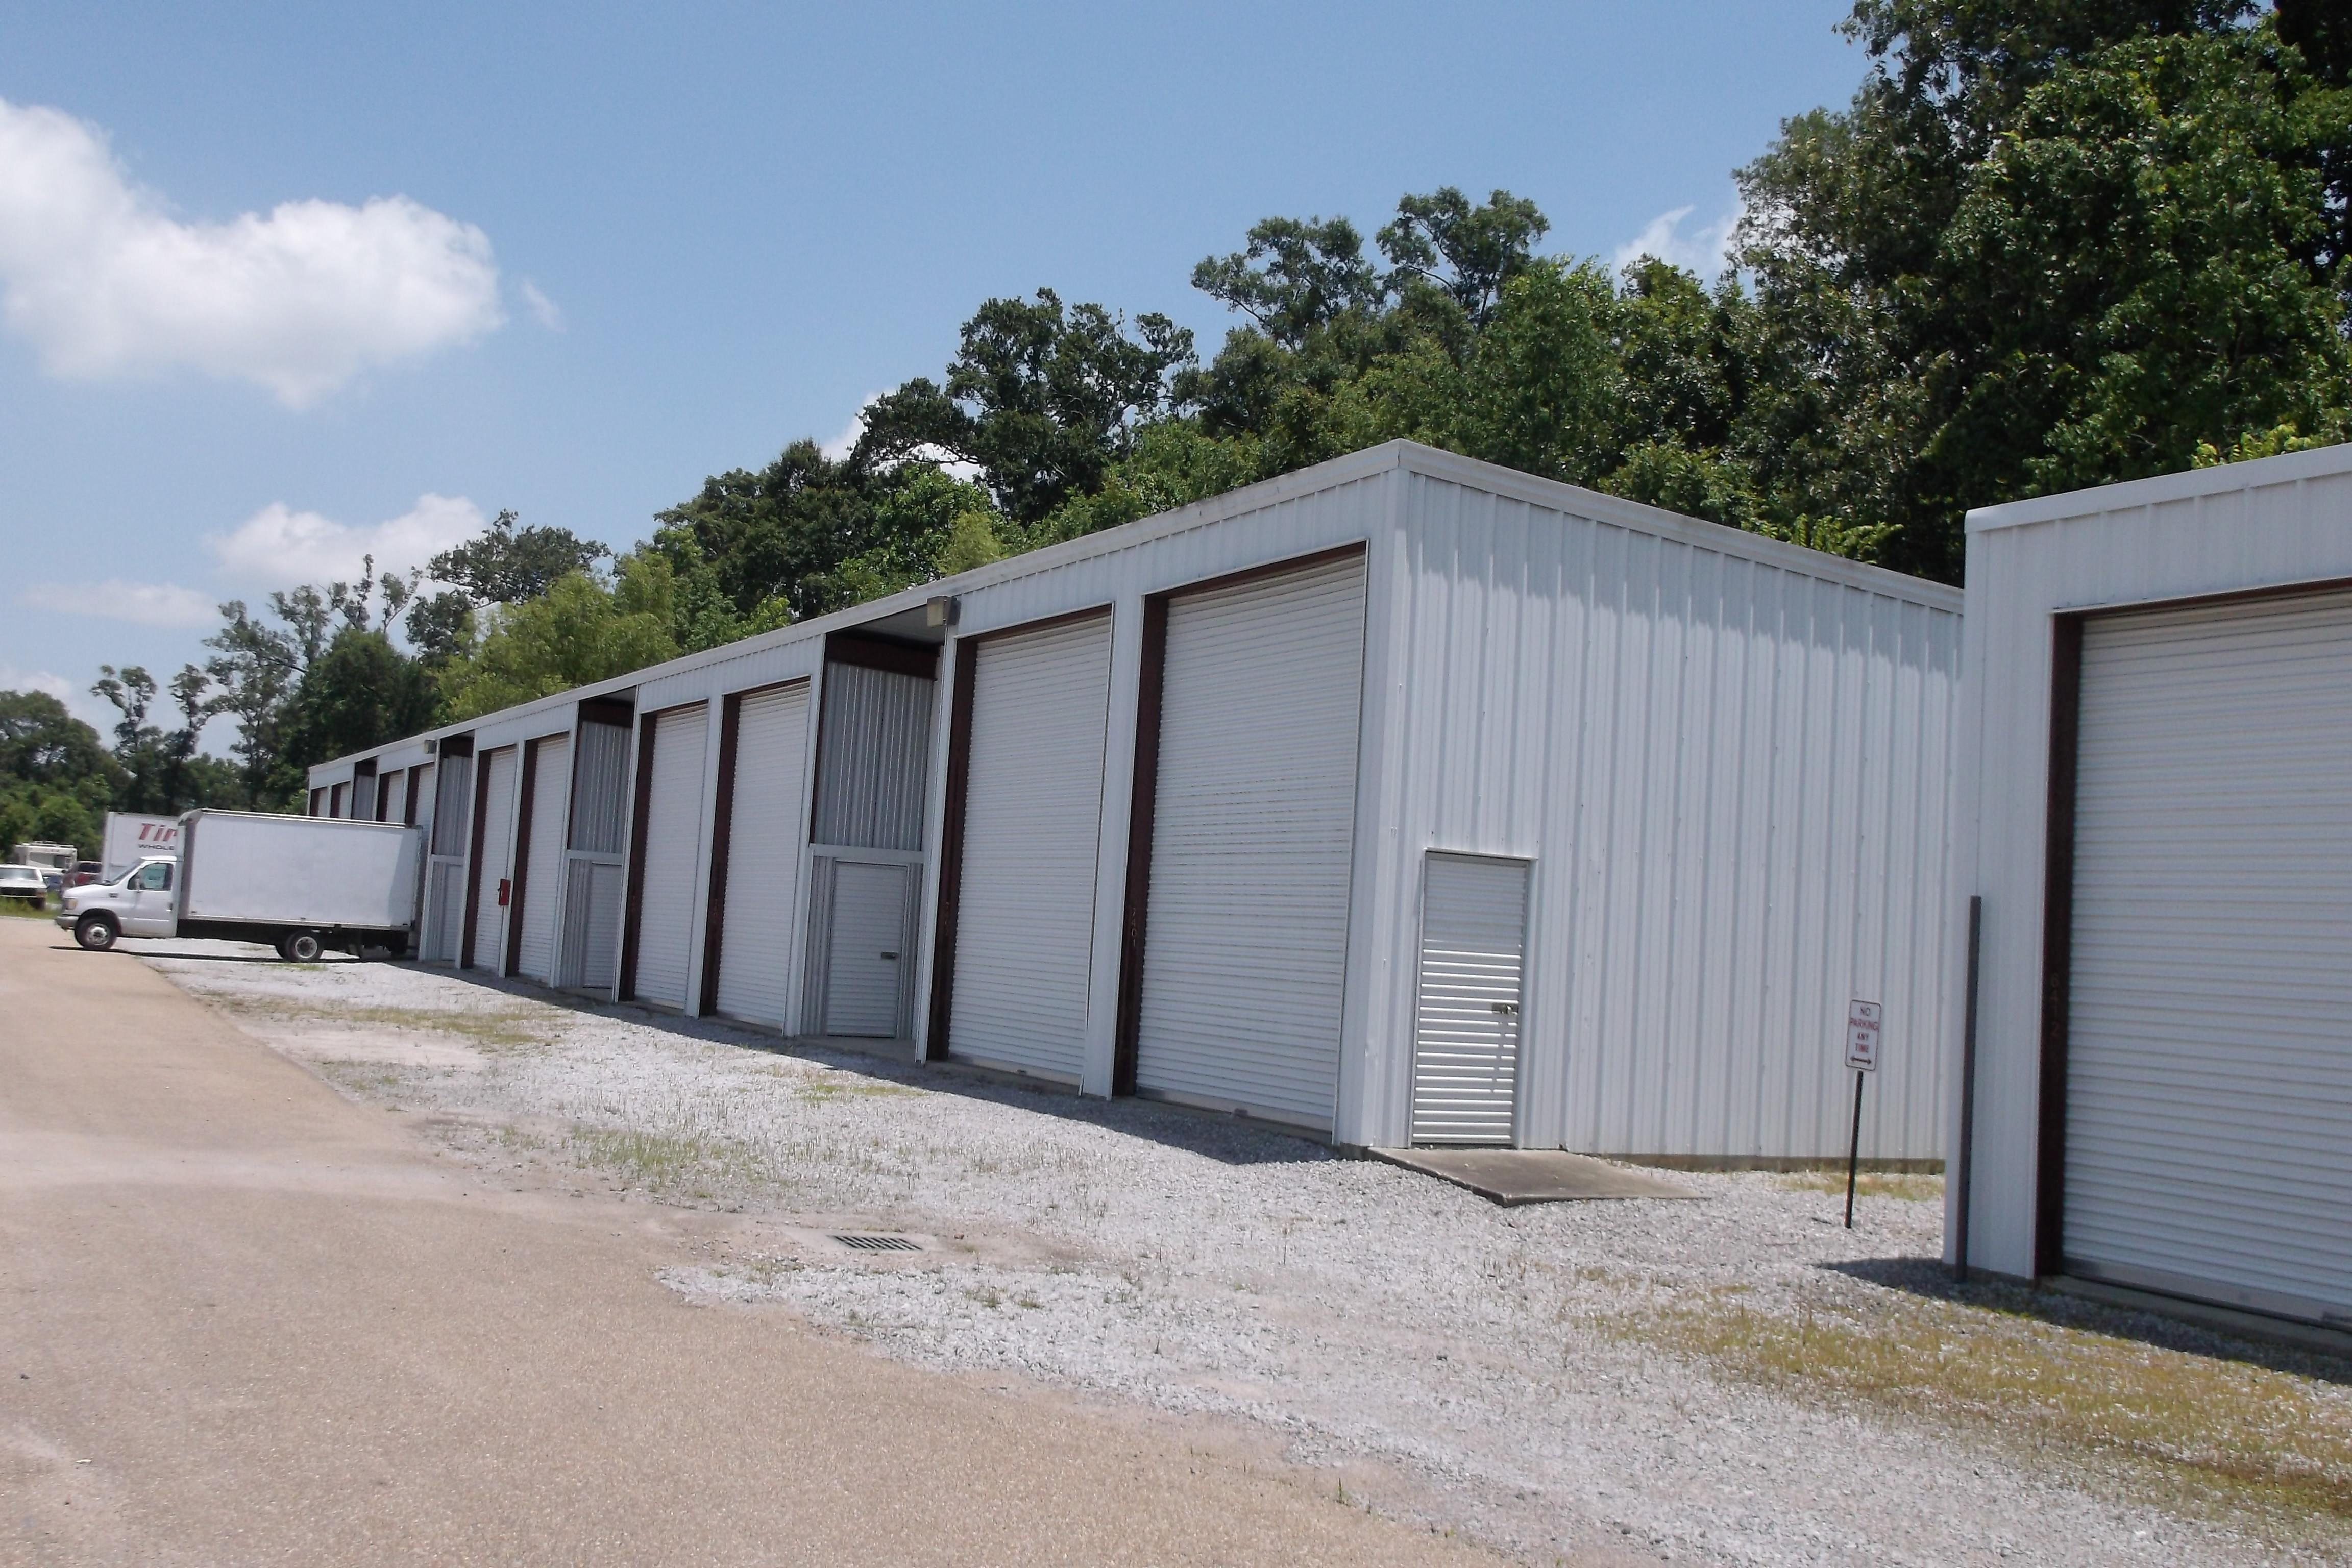 Baton Rouge Self Storage in Baton Rouge, LA 70819 - ChamberofCommerce ...